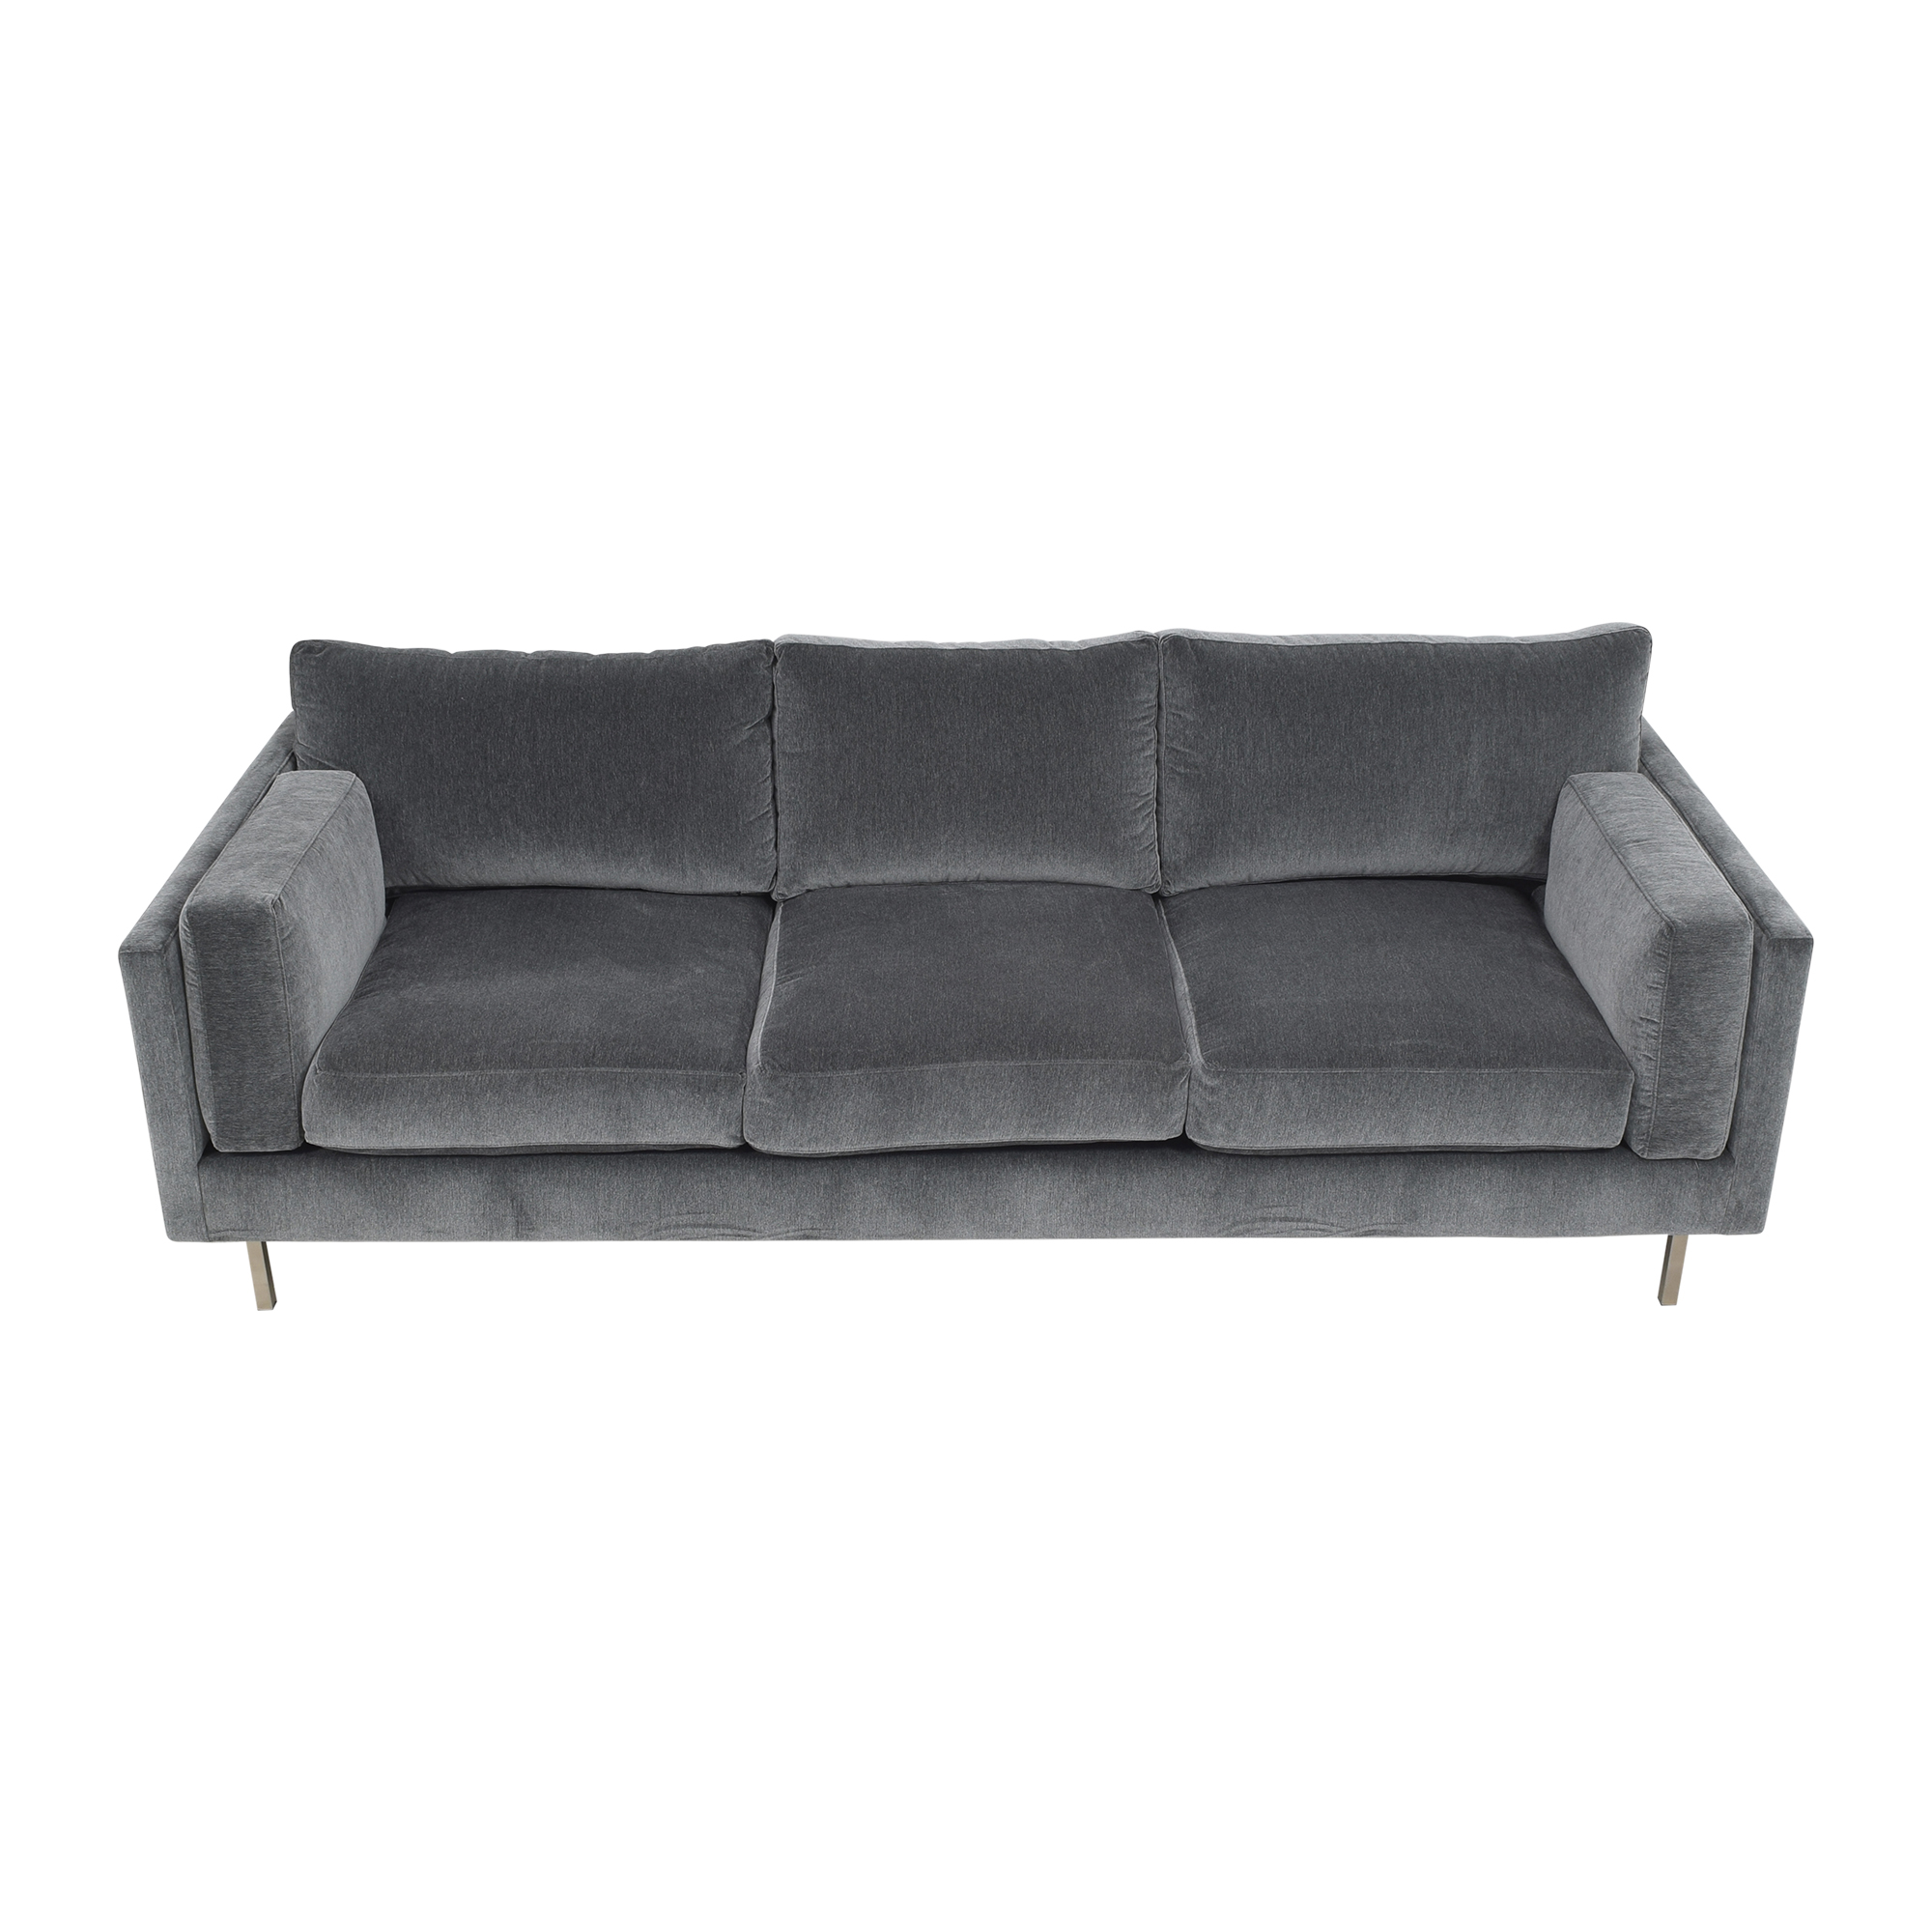 BenchMade Modern Skinny Fat Sofa BenchMade Modern